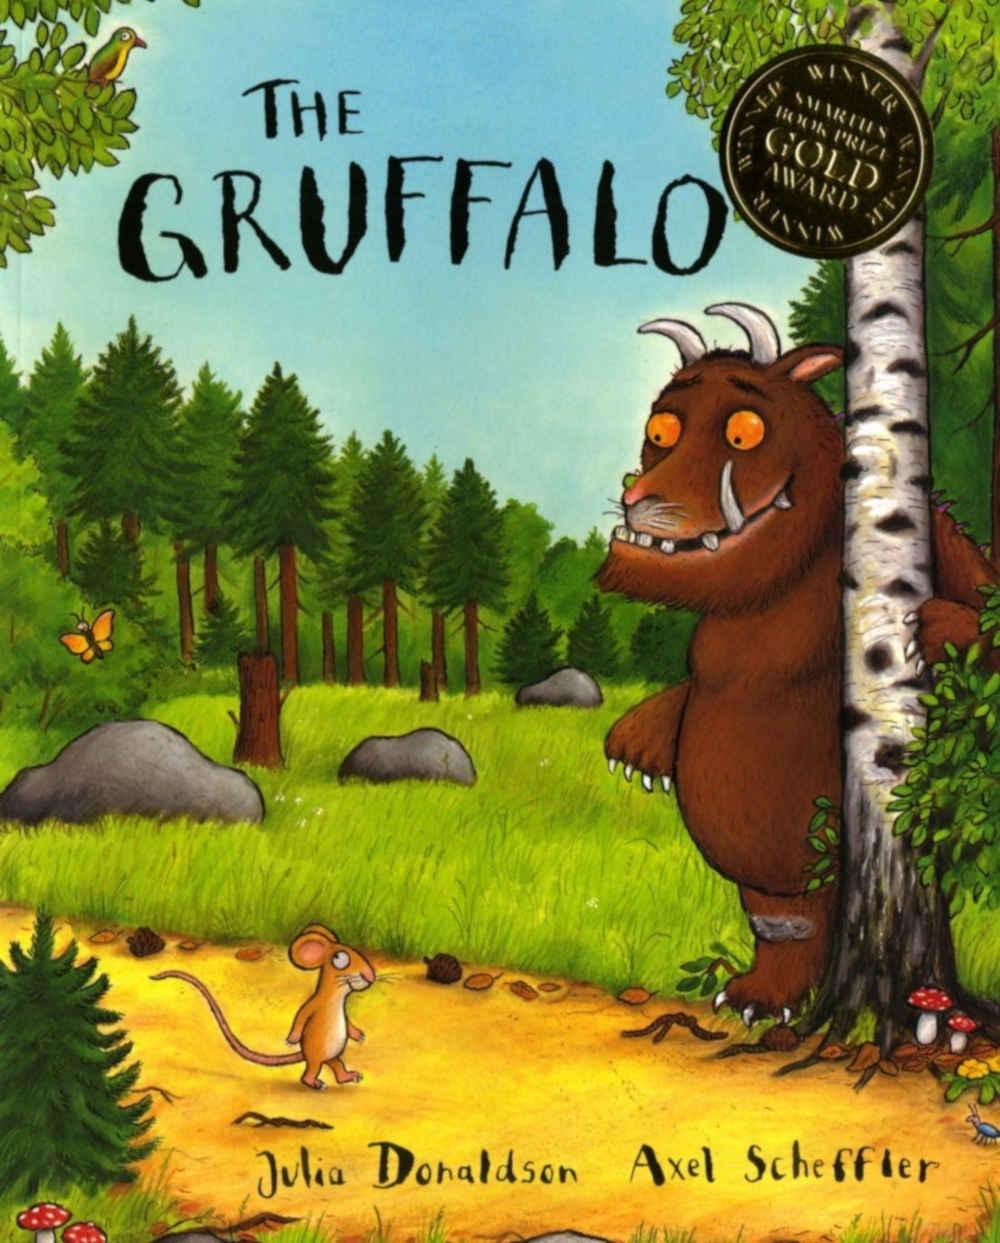 "Wielkoformatowe wydanie baestsellera ""The Gruffalo"""